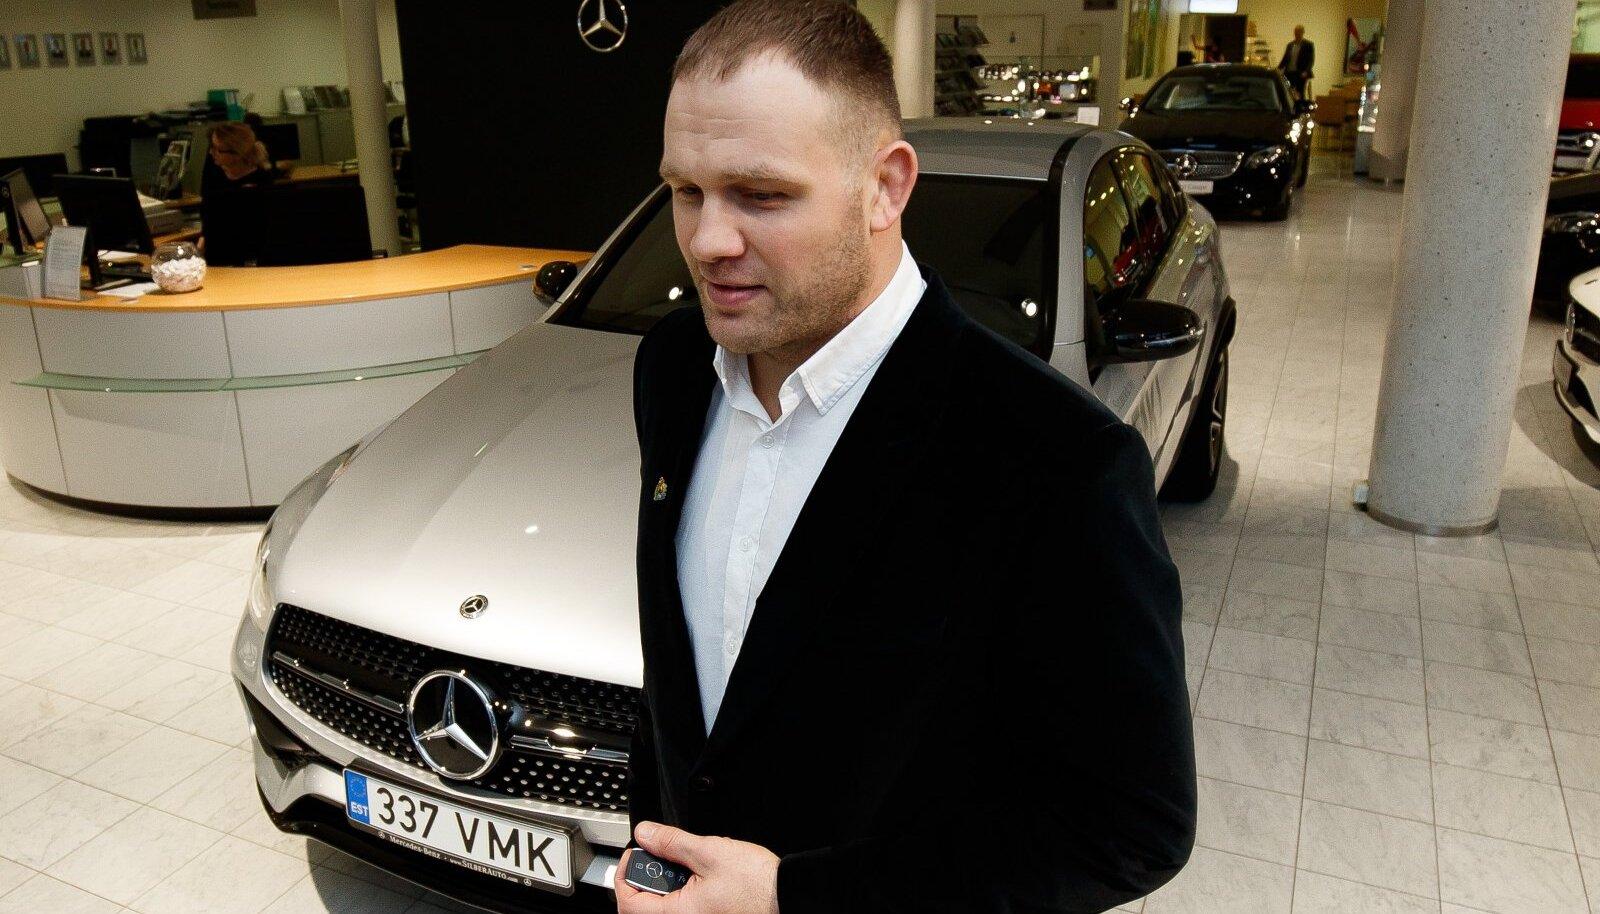 Tallinn, 16.12.2019. Silberauto esonidses anti Heiki Nabile üle Mercedes-Benz GLC 220 d 4 MATIC Coupe võtmed.